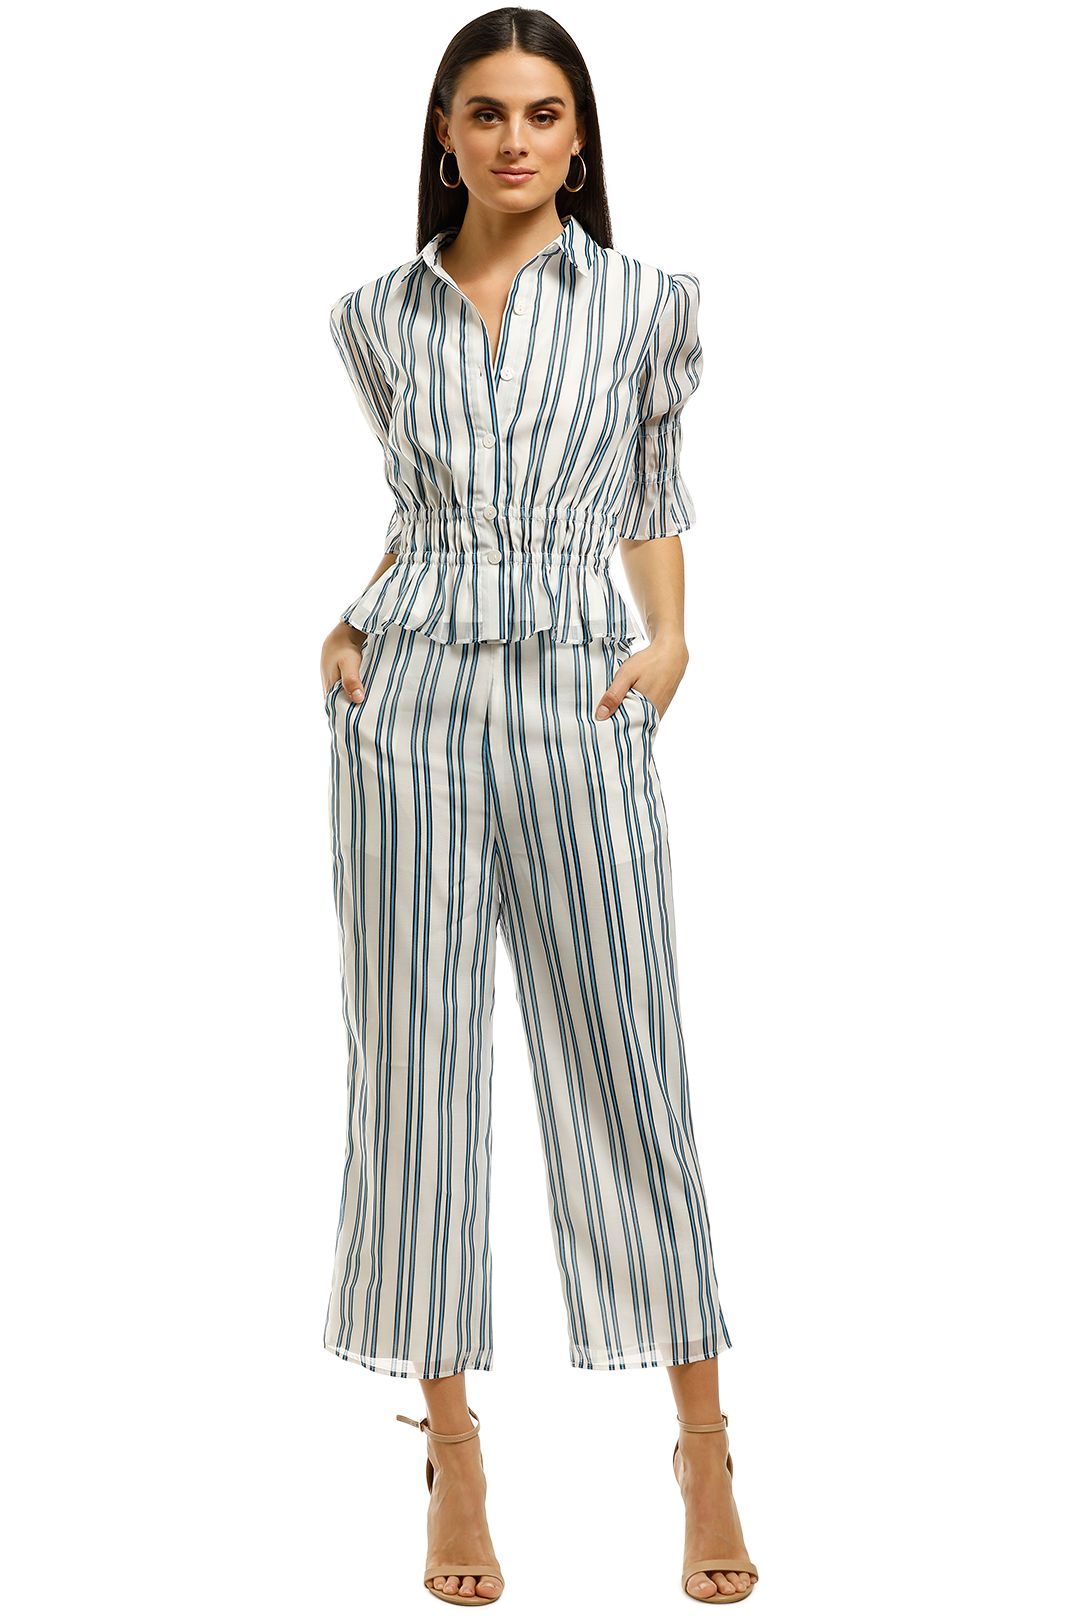 The-East-Order-Brielle-Pants-Blue-Stripes-Front